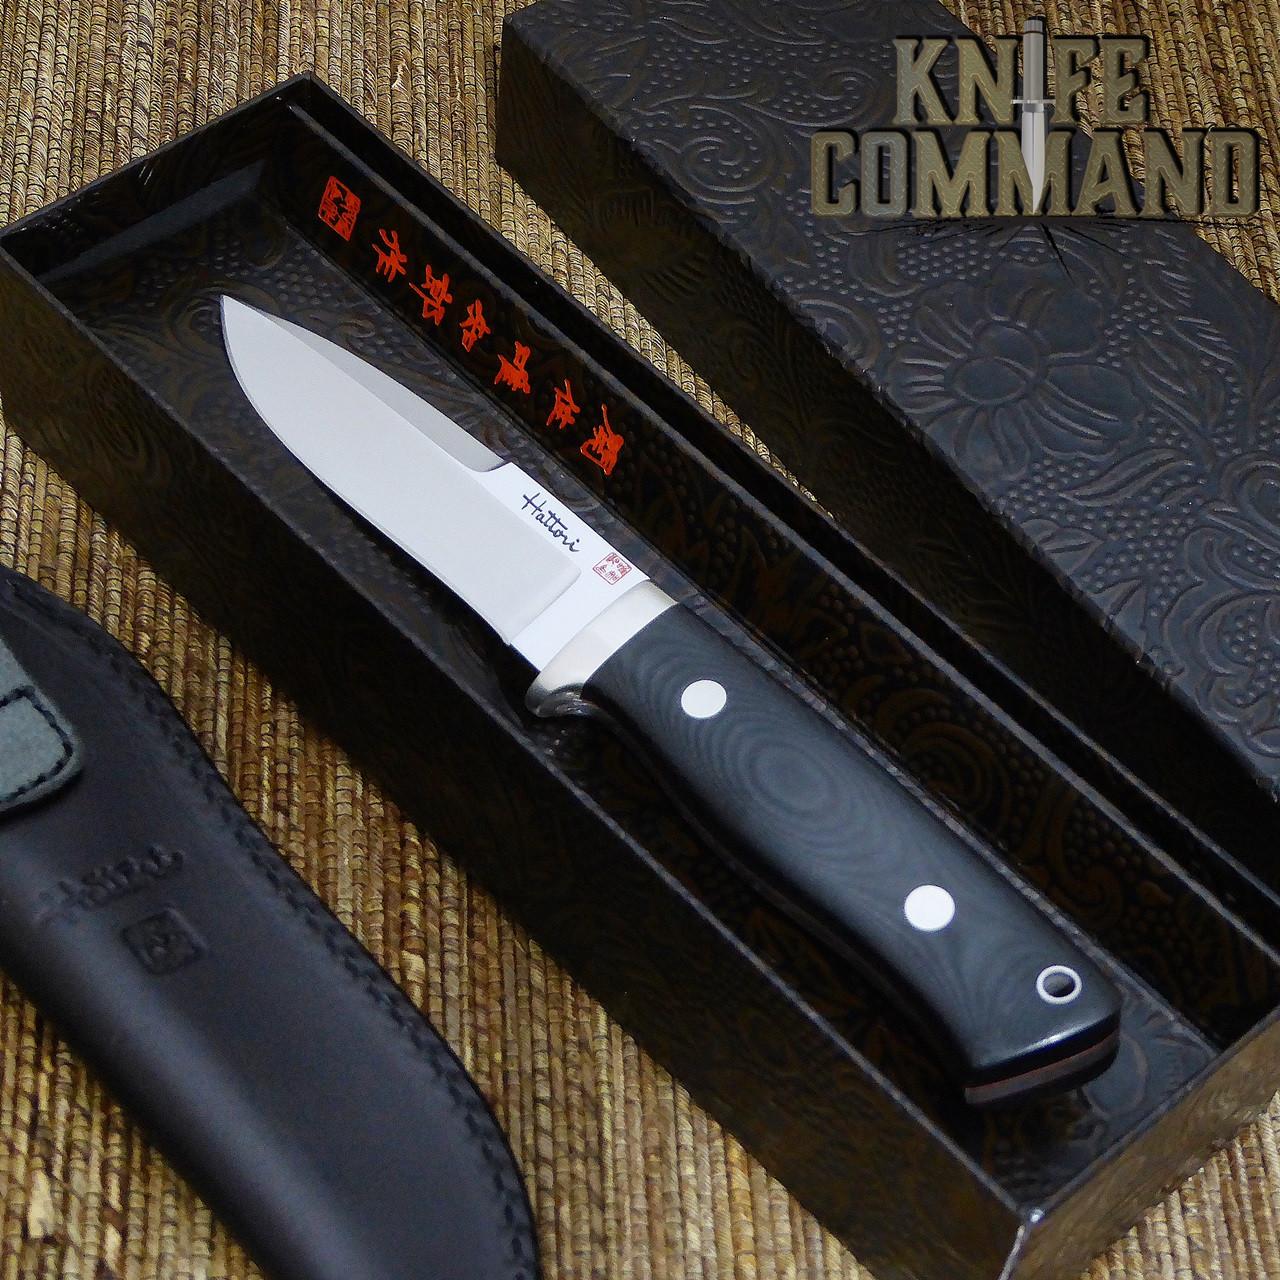 Hattori Knives Dream Hunter Ht-05 Red Hunting Knife.  Fancy presentation box.